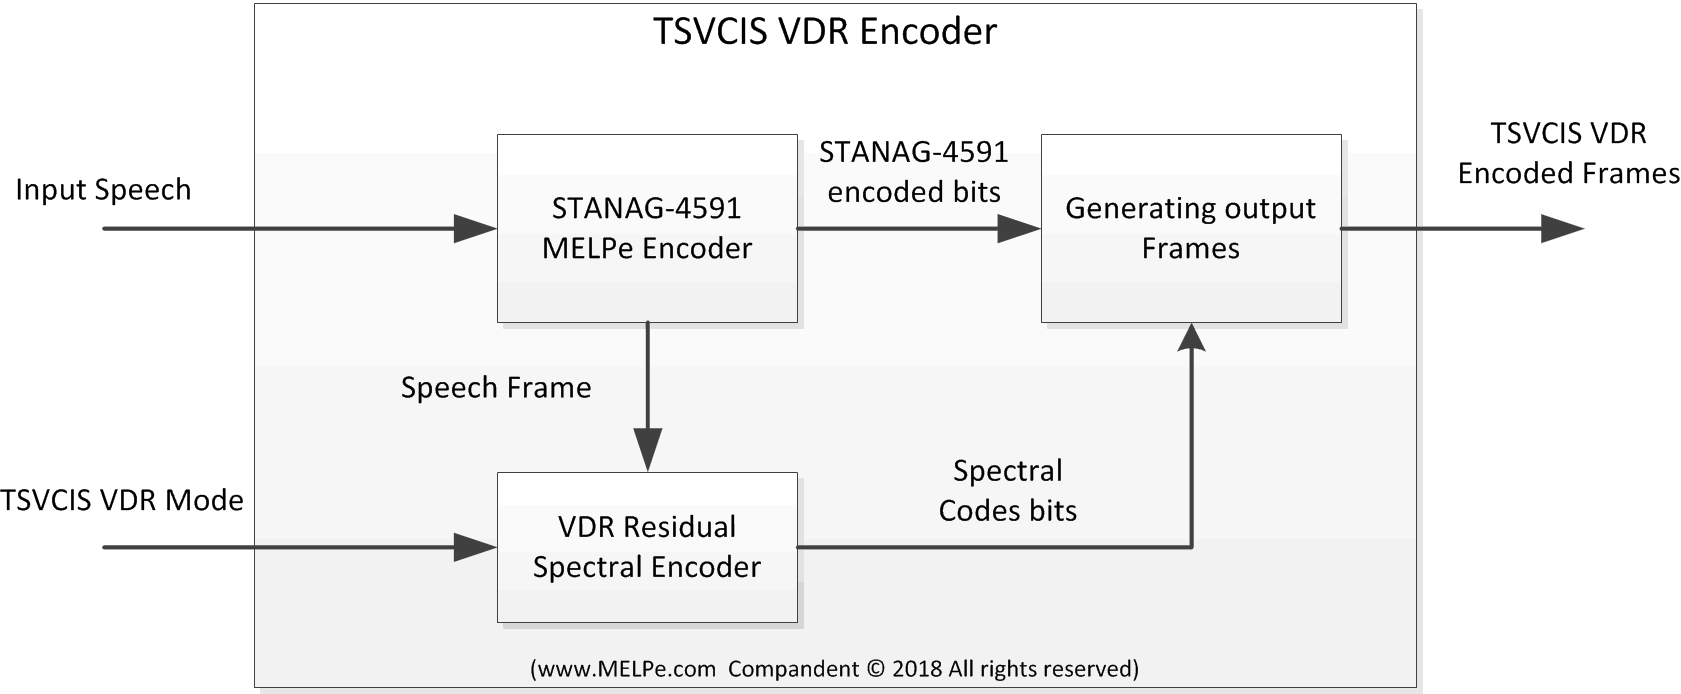 tsvcis-vdr-encoder